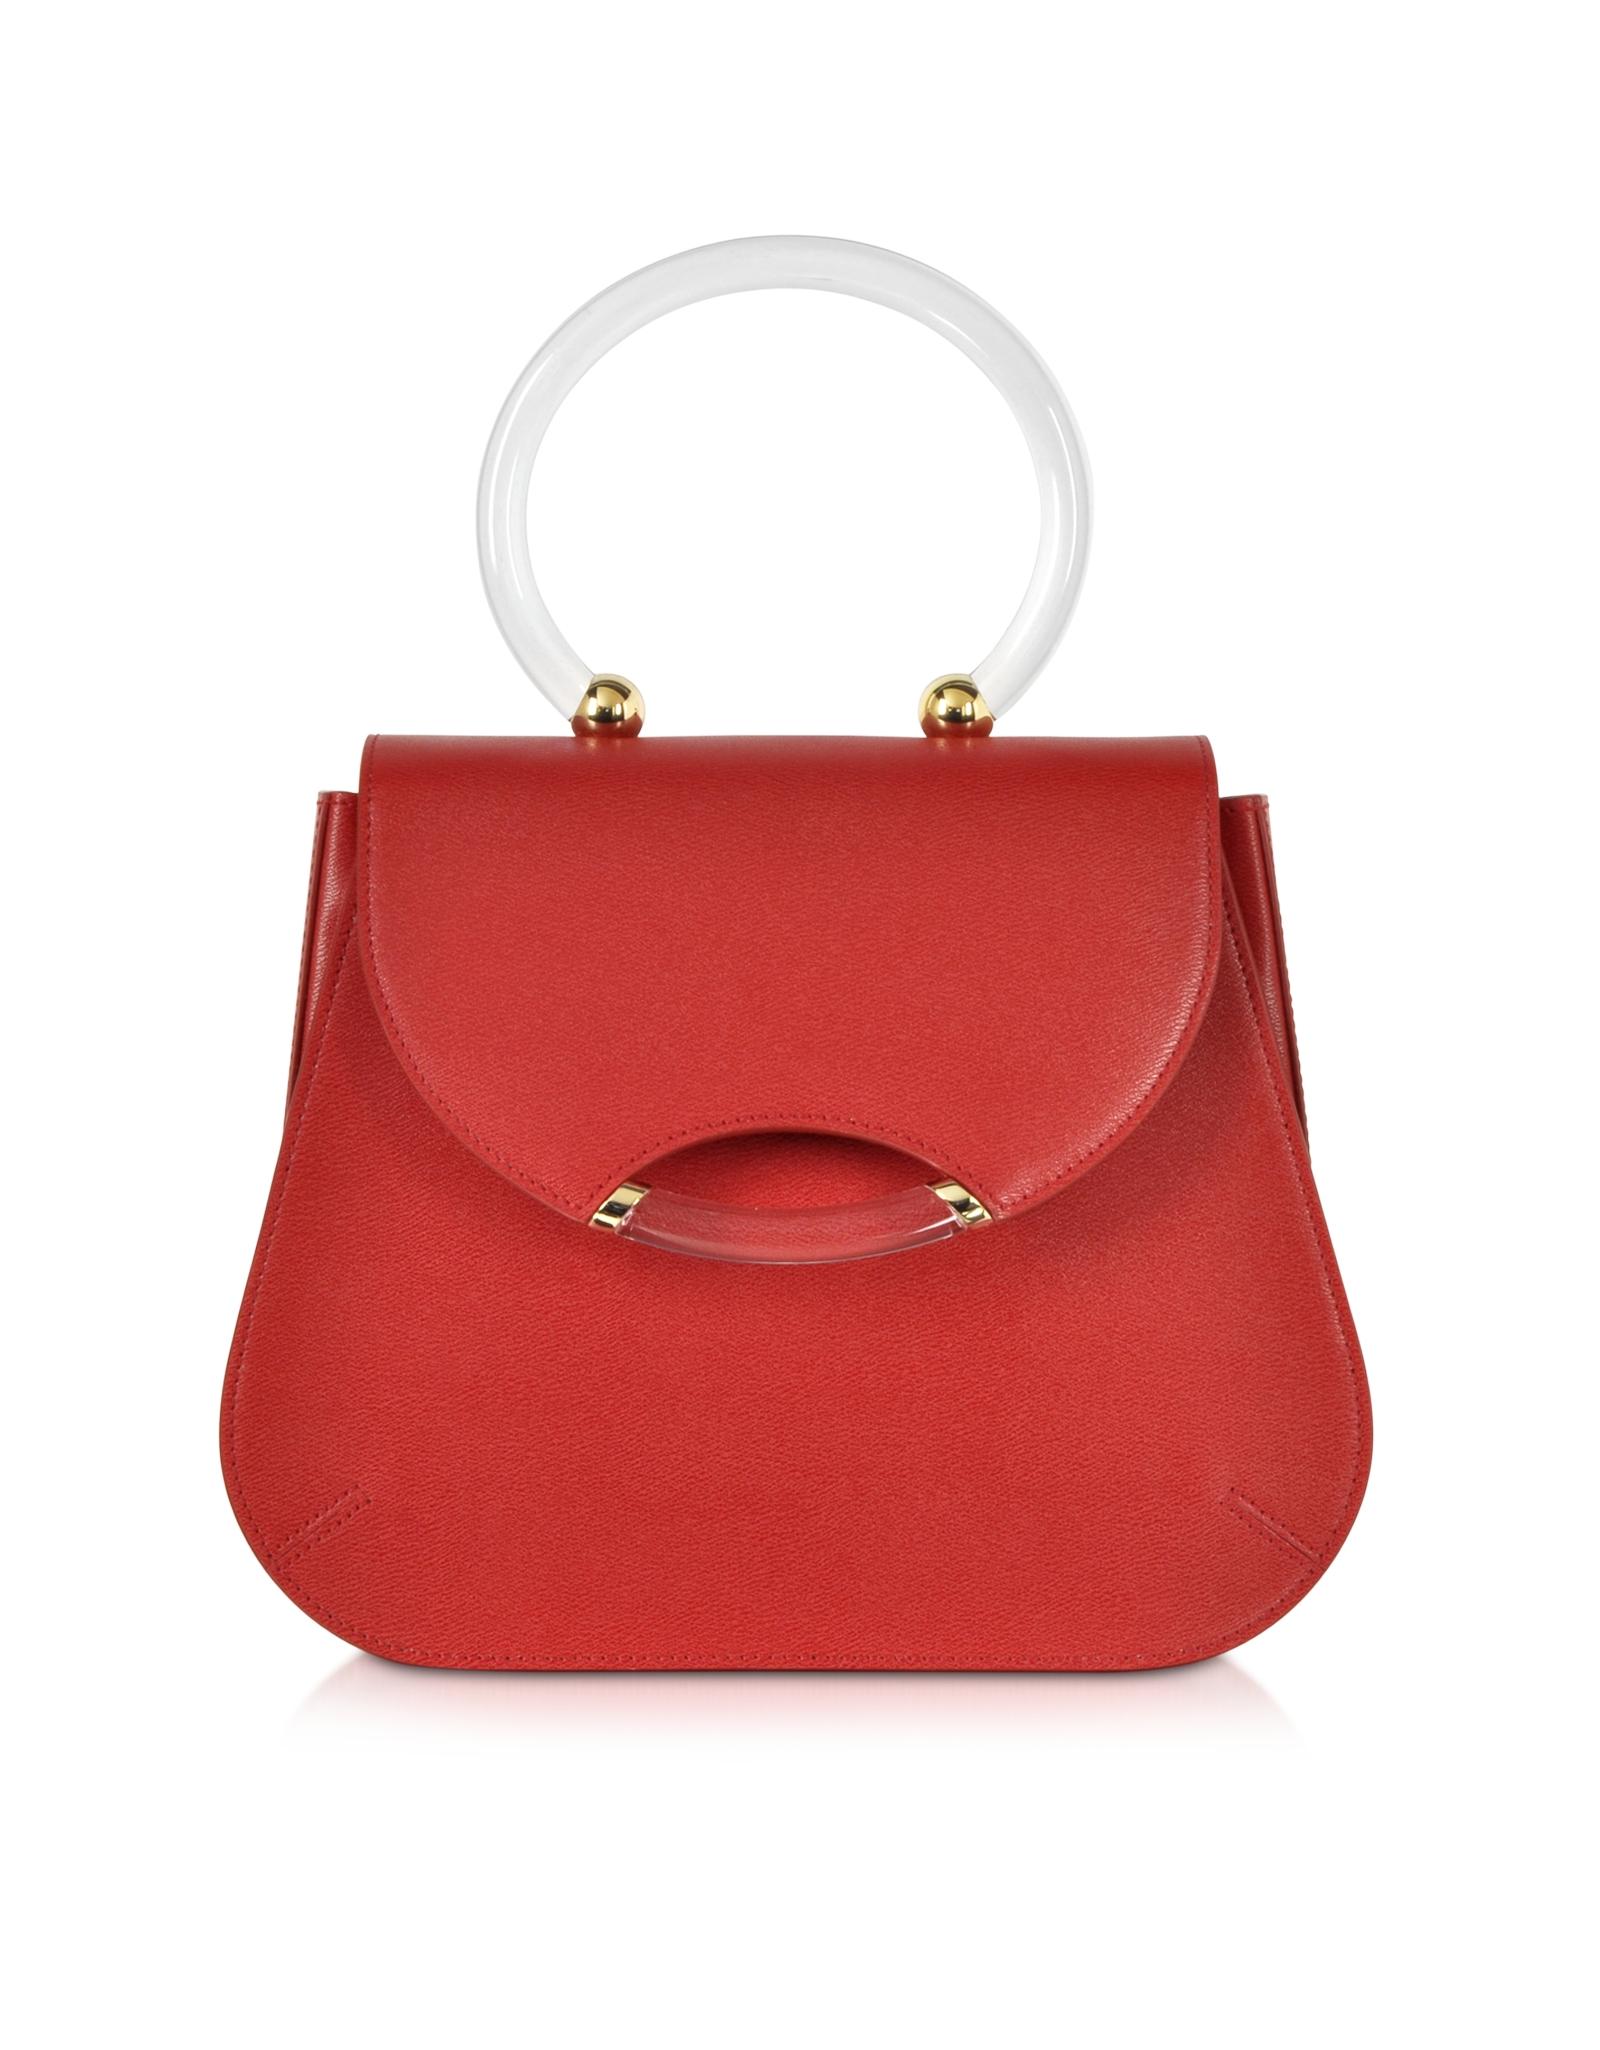 Lyst - Charlotte Olympia Newman Red Leather Satchel W transparent ... b28f3a78dd